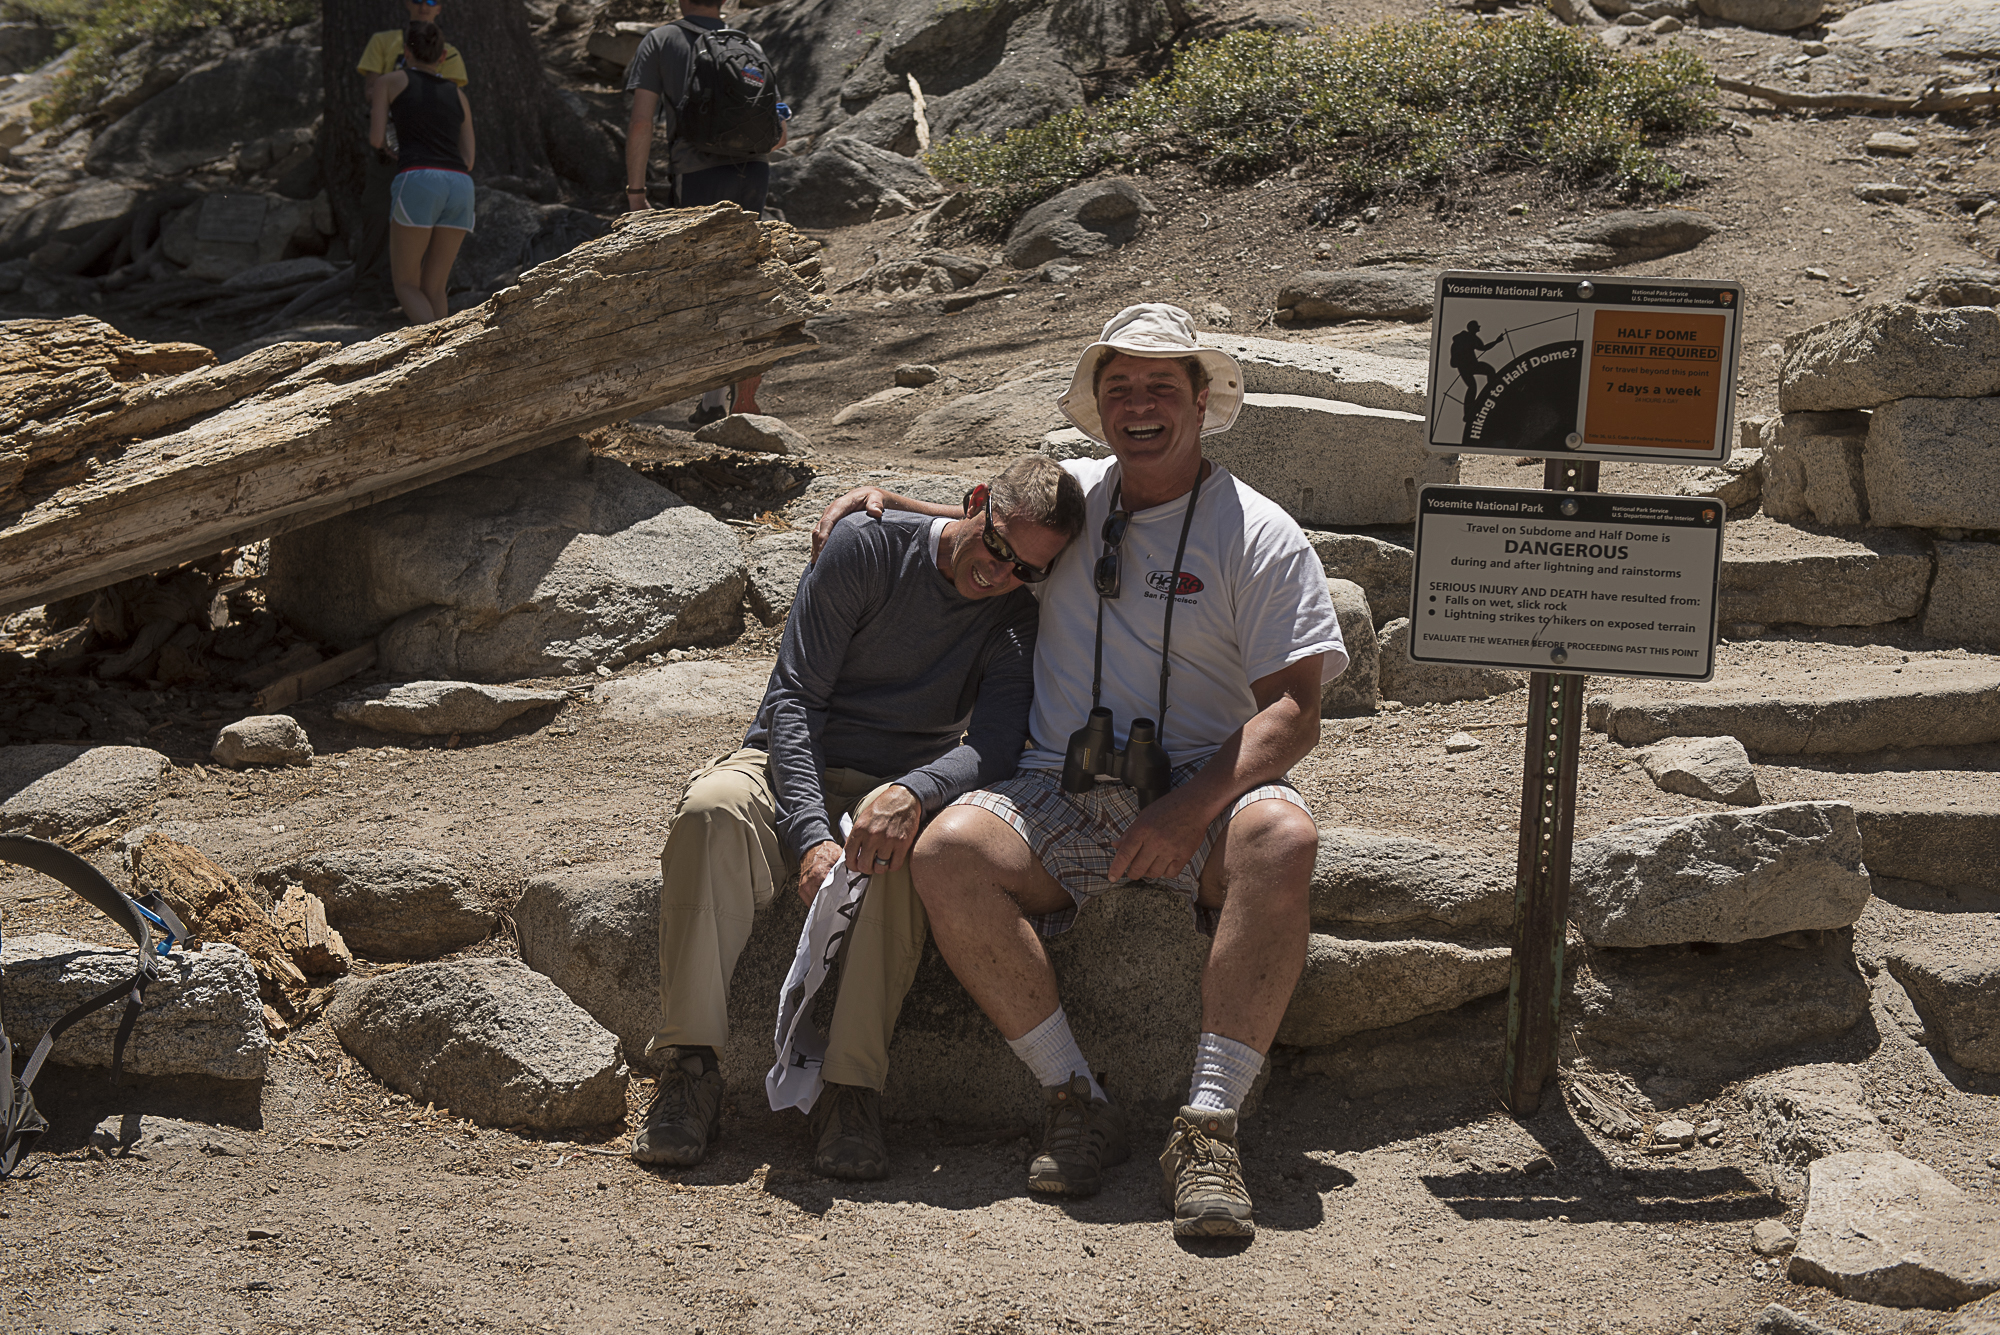 Yosemite-HalfDome-WCWKS-YExplore-DeGrazio-JUN2016-18